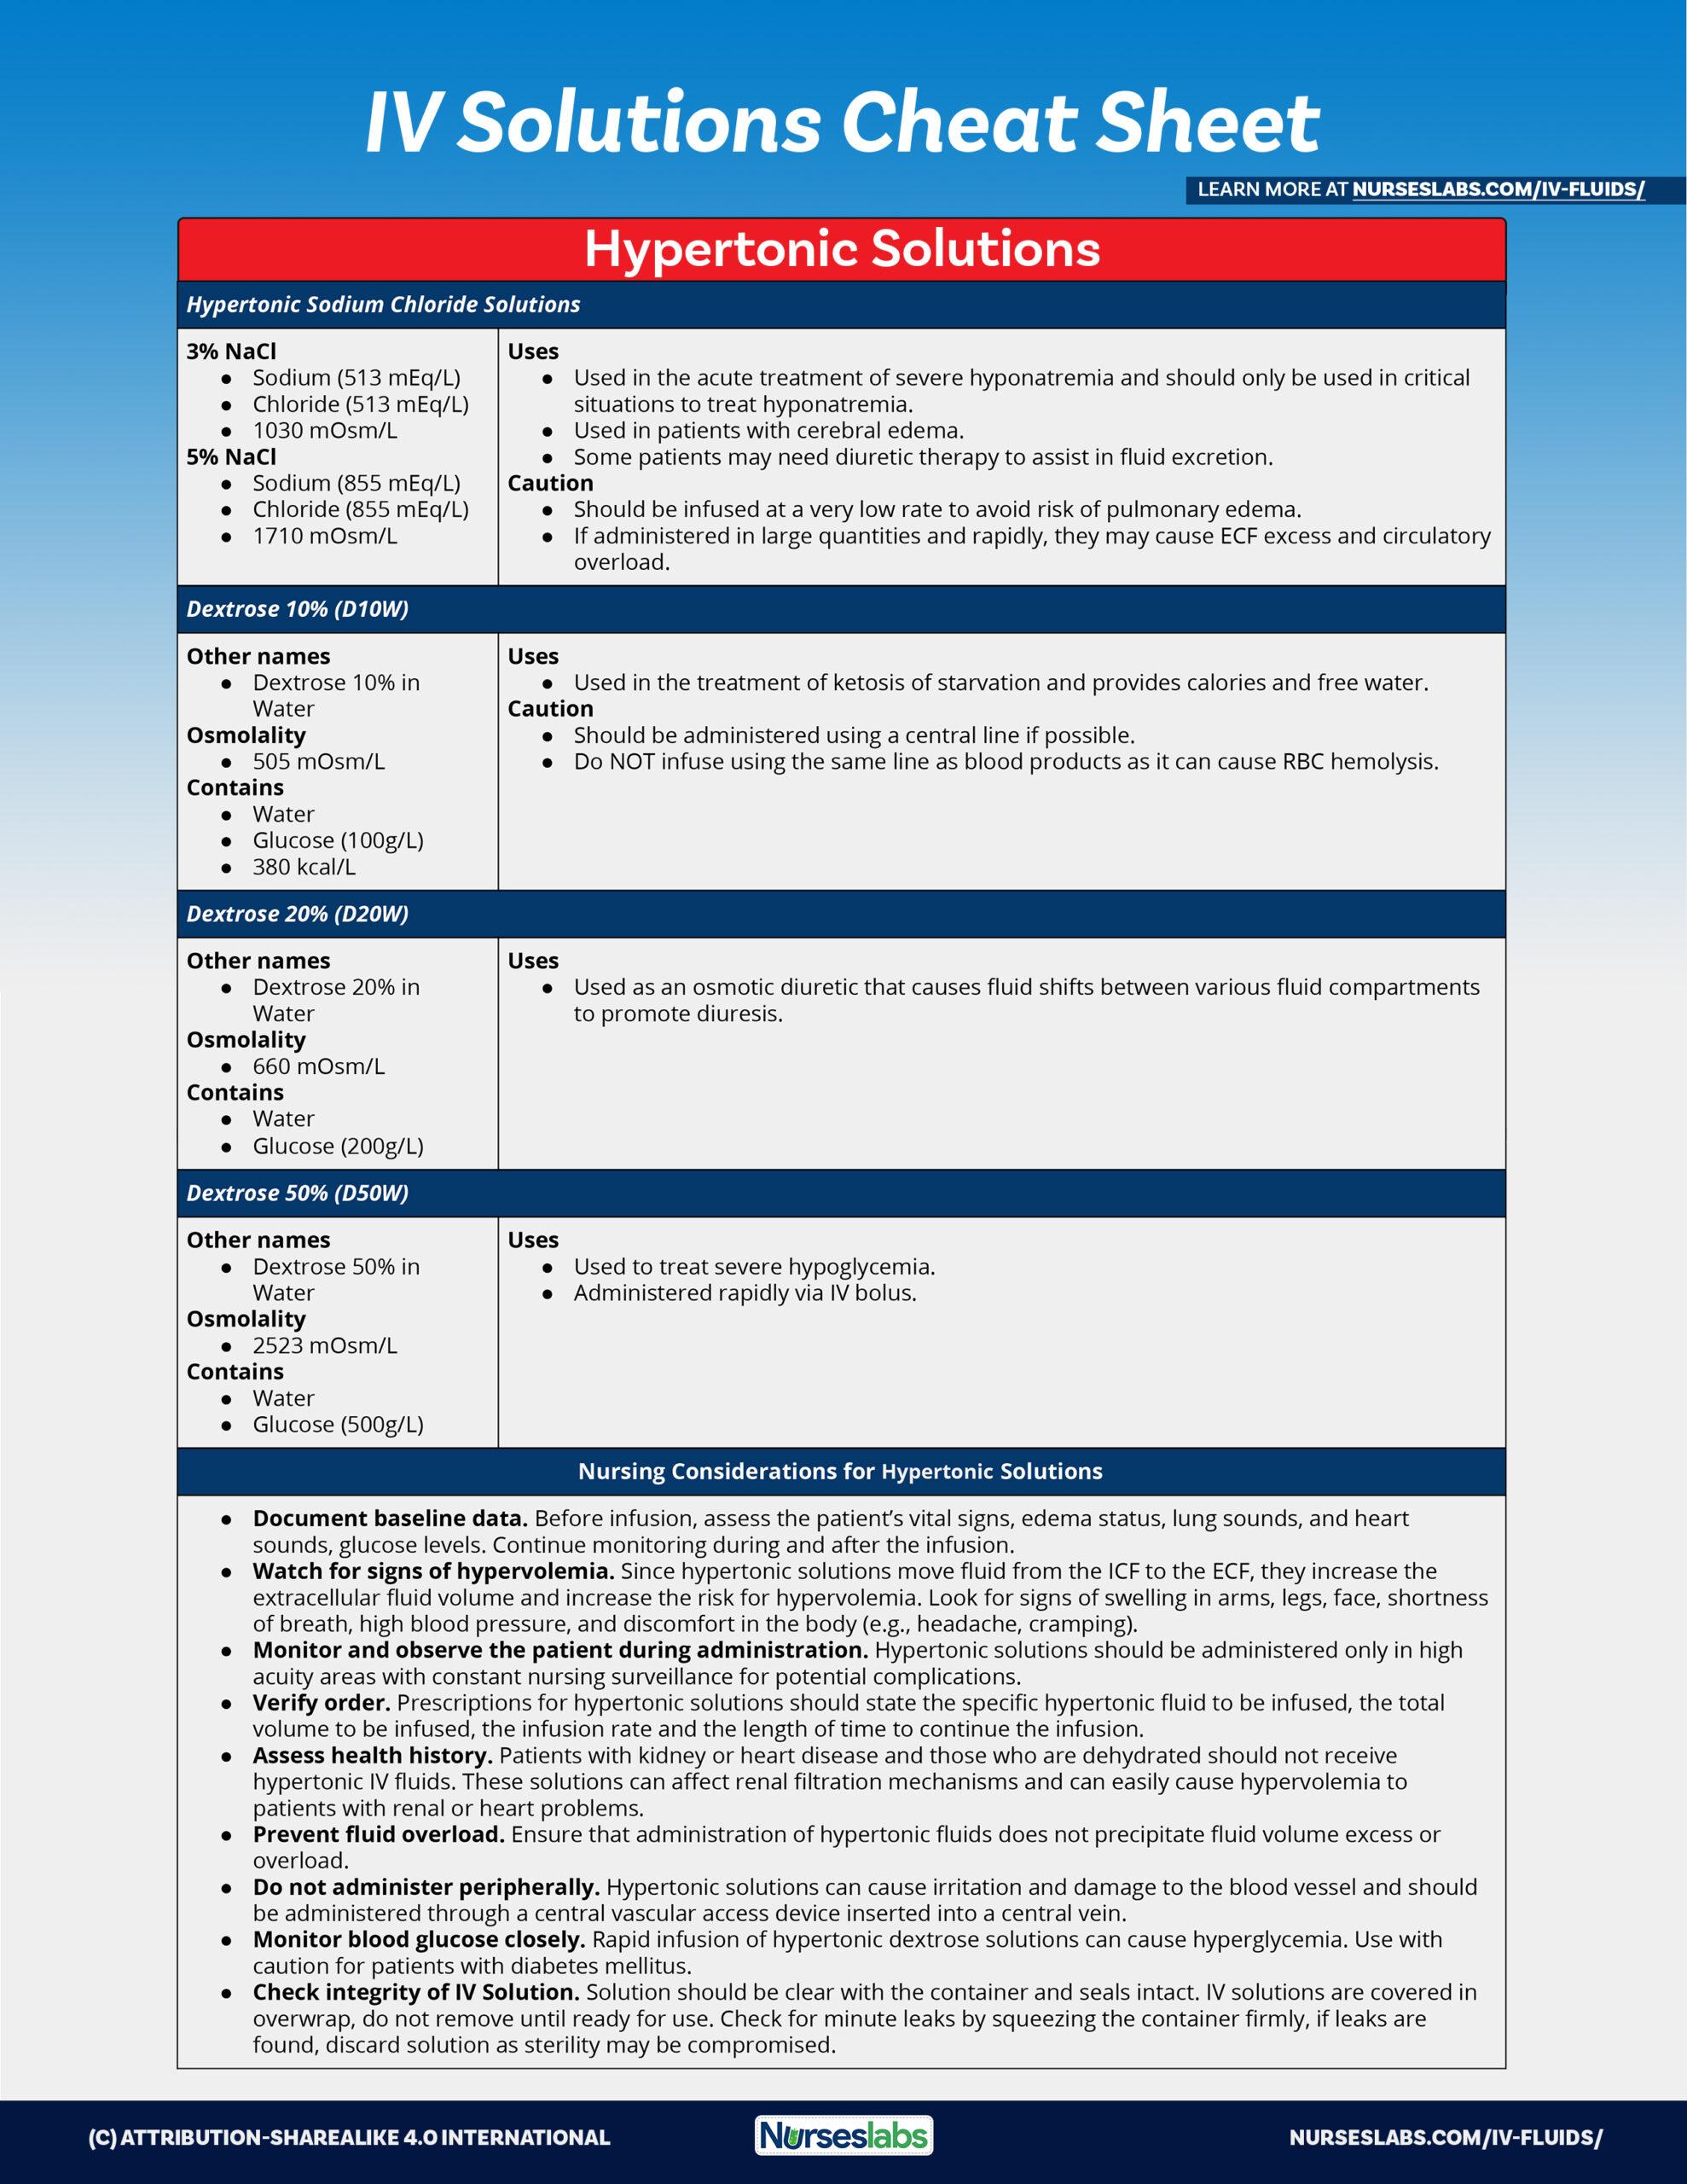 Hypertonic IV Fluids and Solutions Cheat Sheet